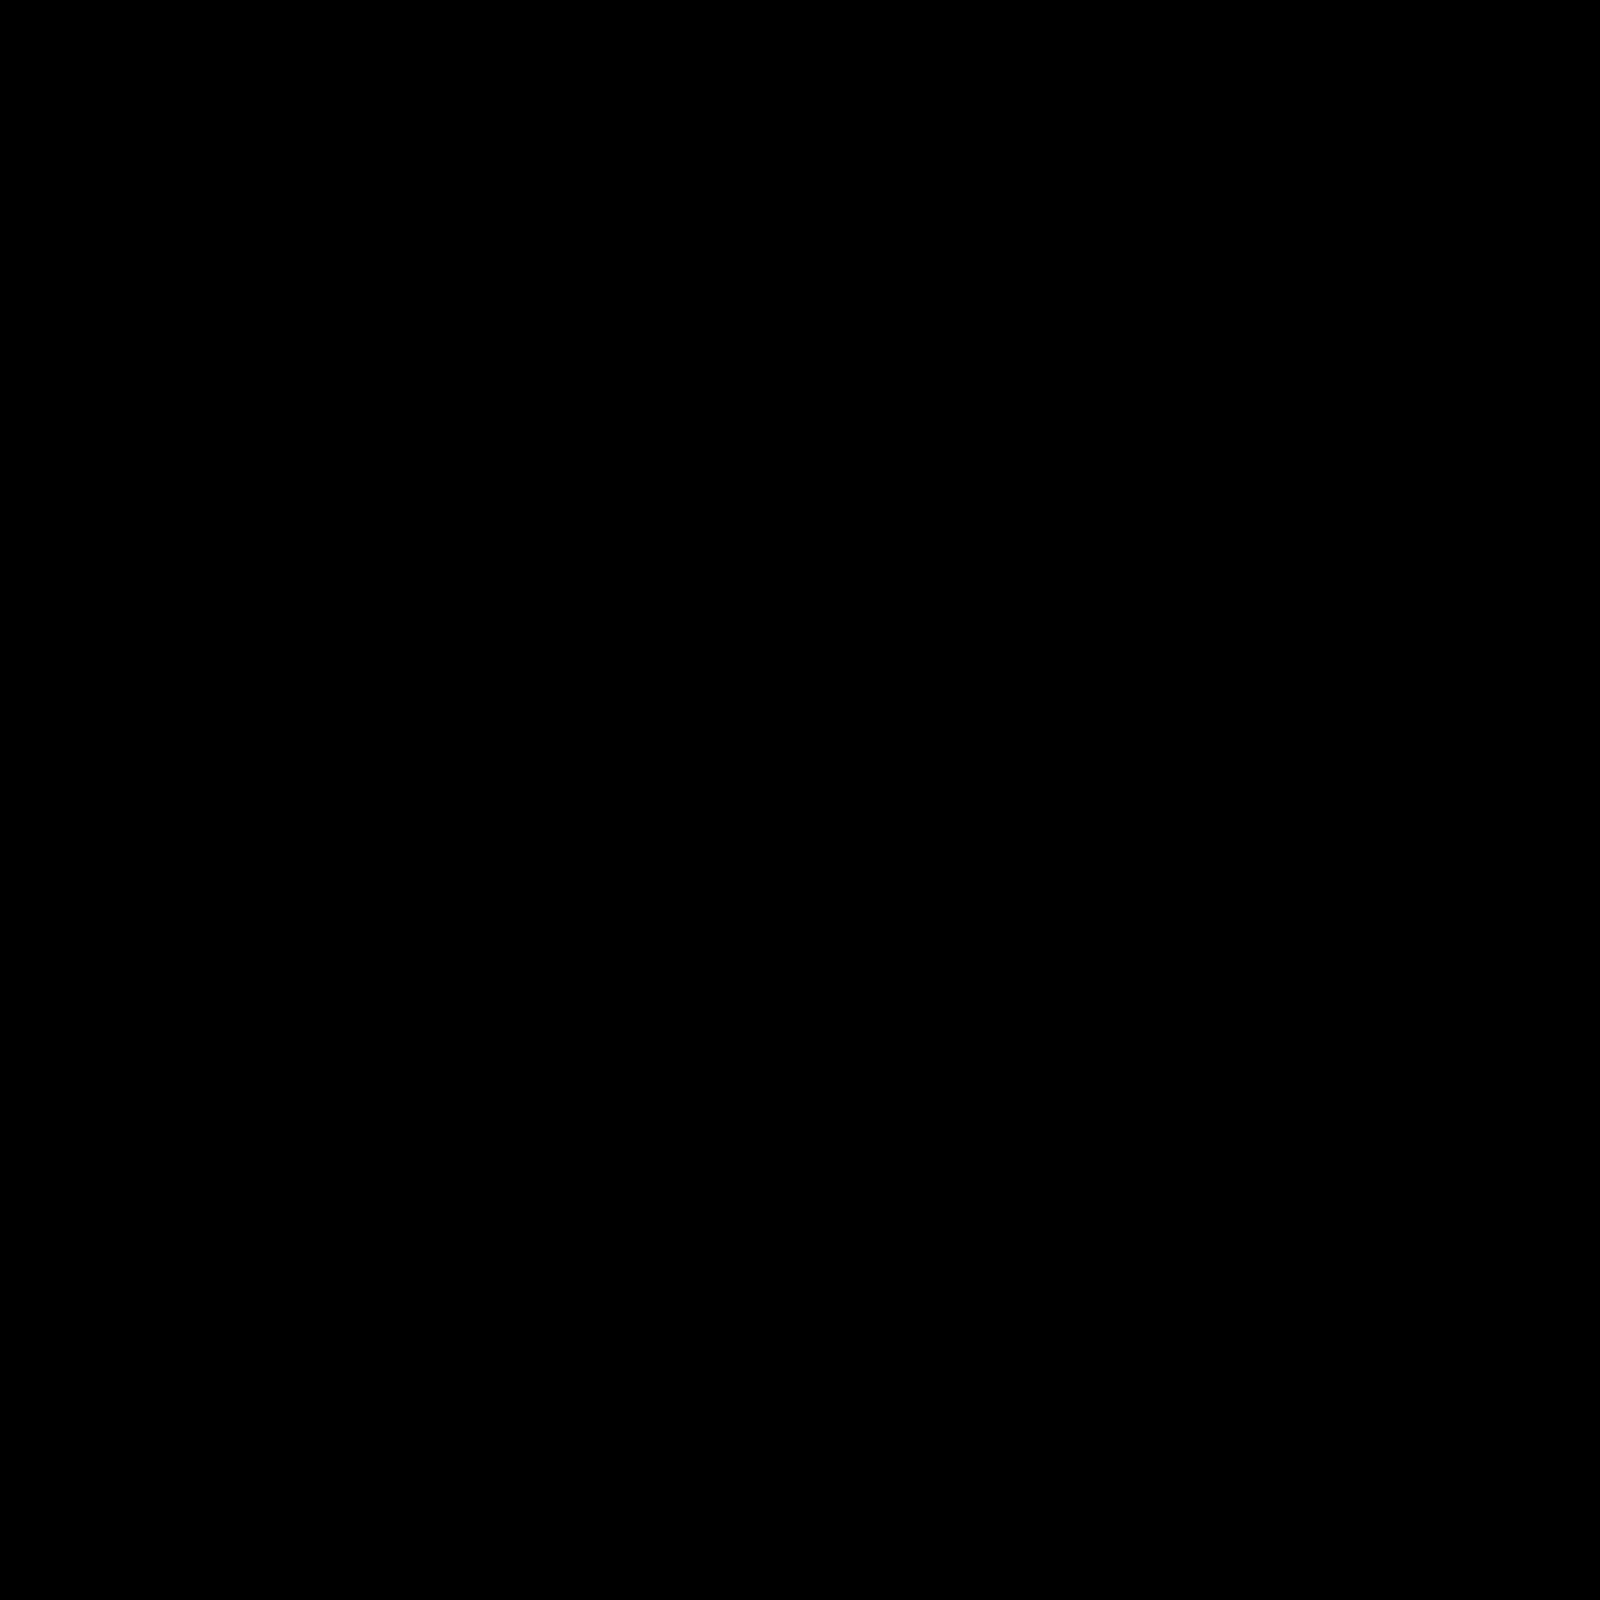 Pocket Compass icon